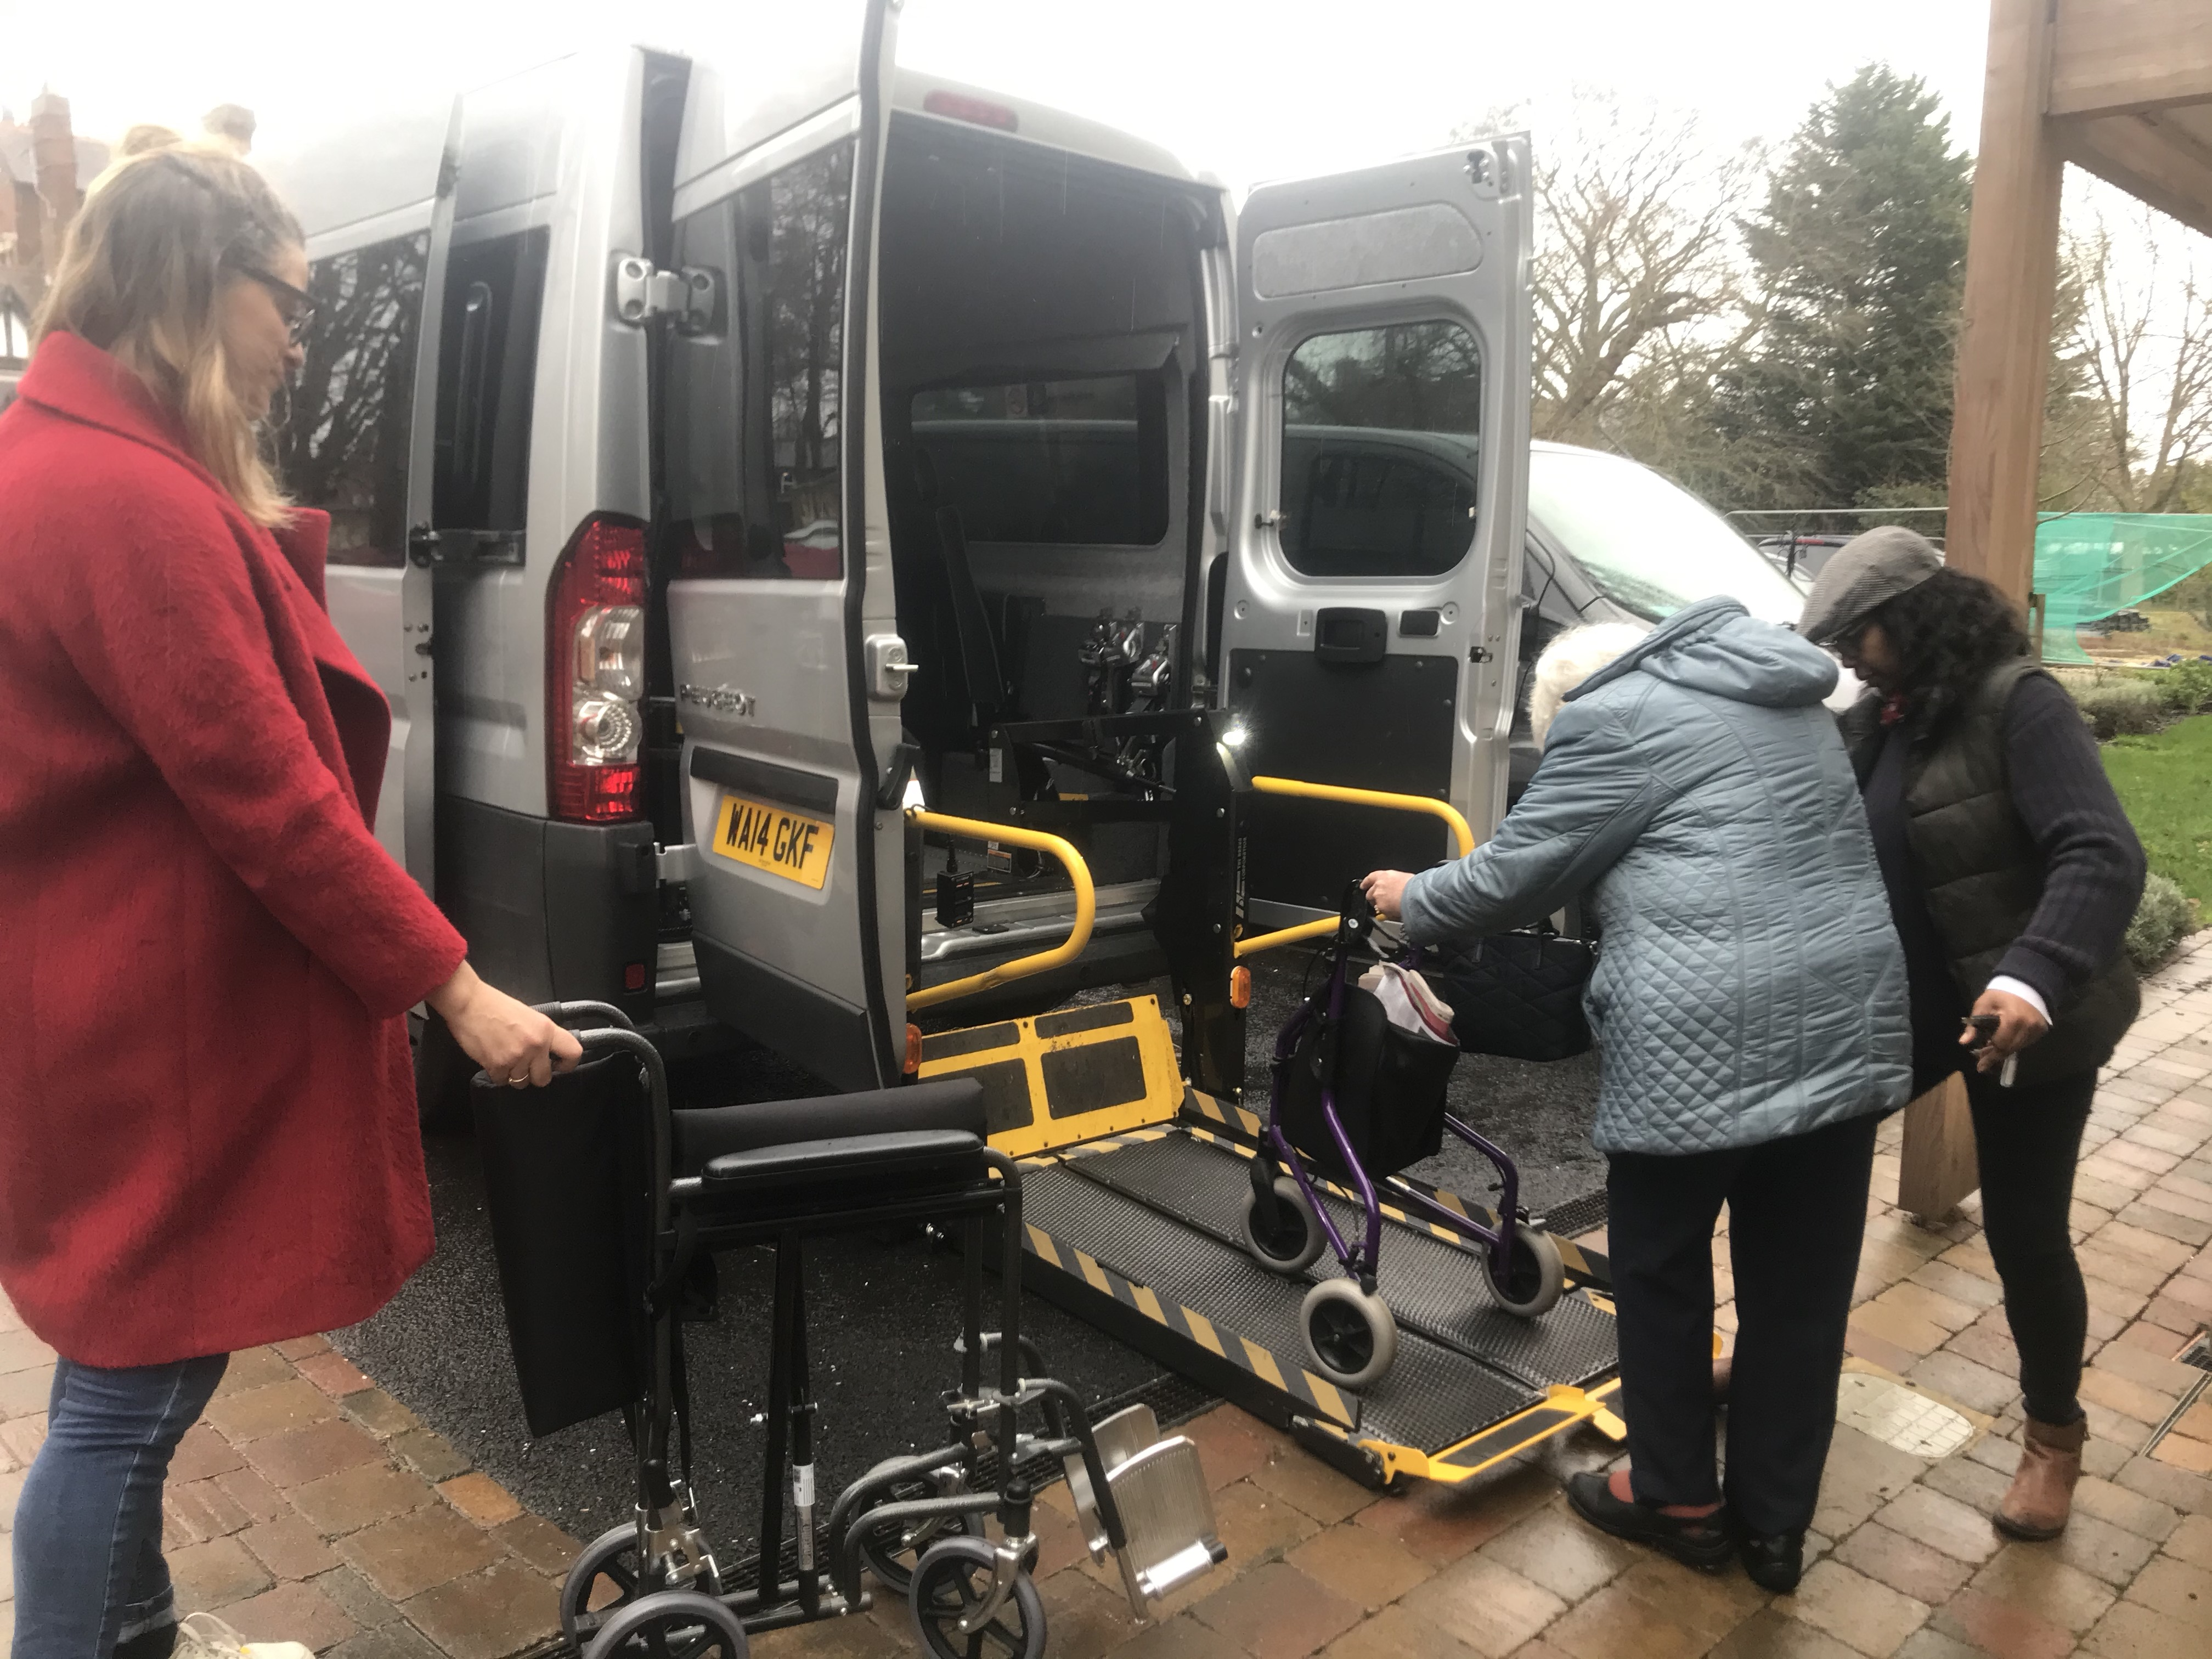 Fairfield minibus outing